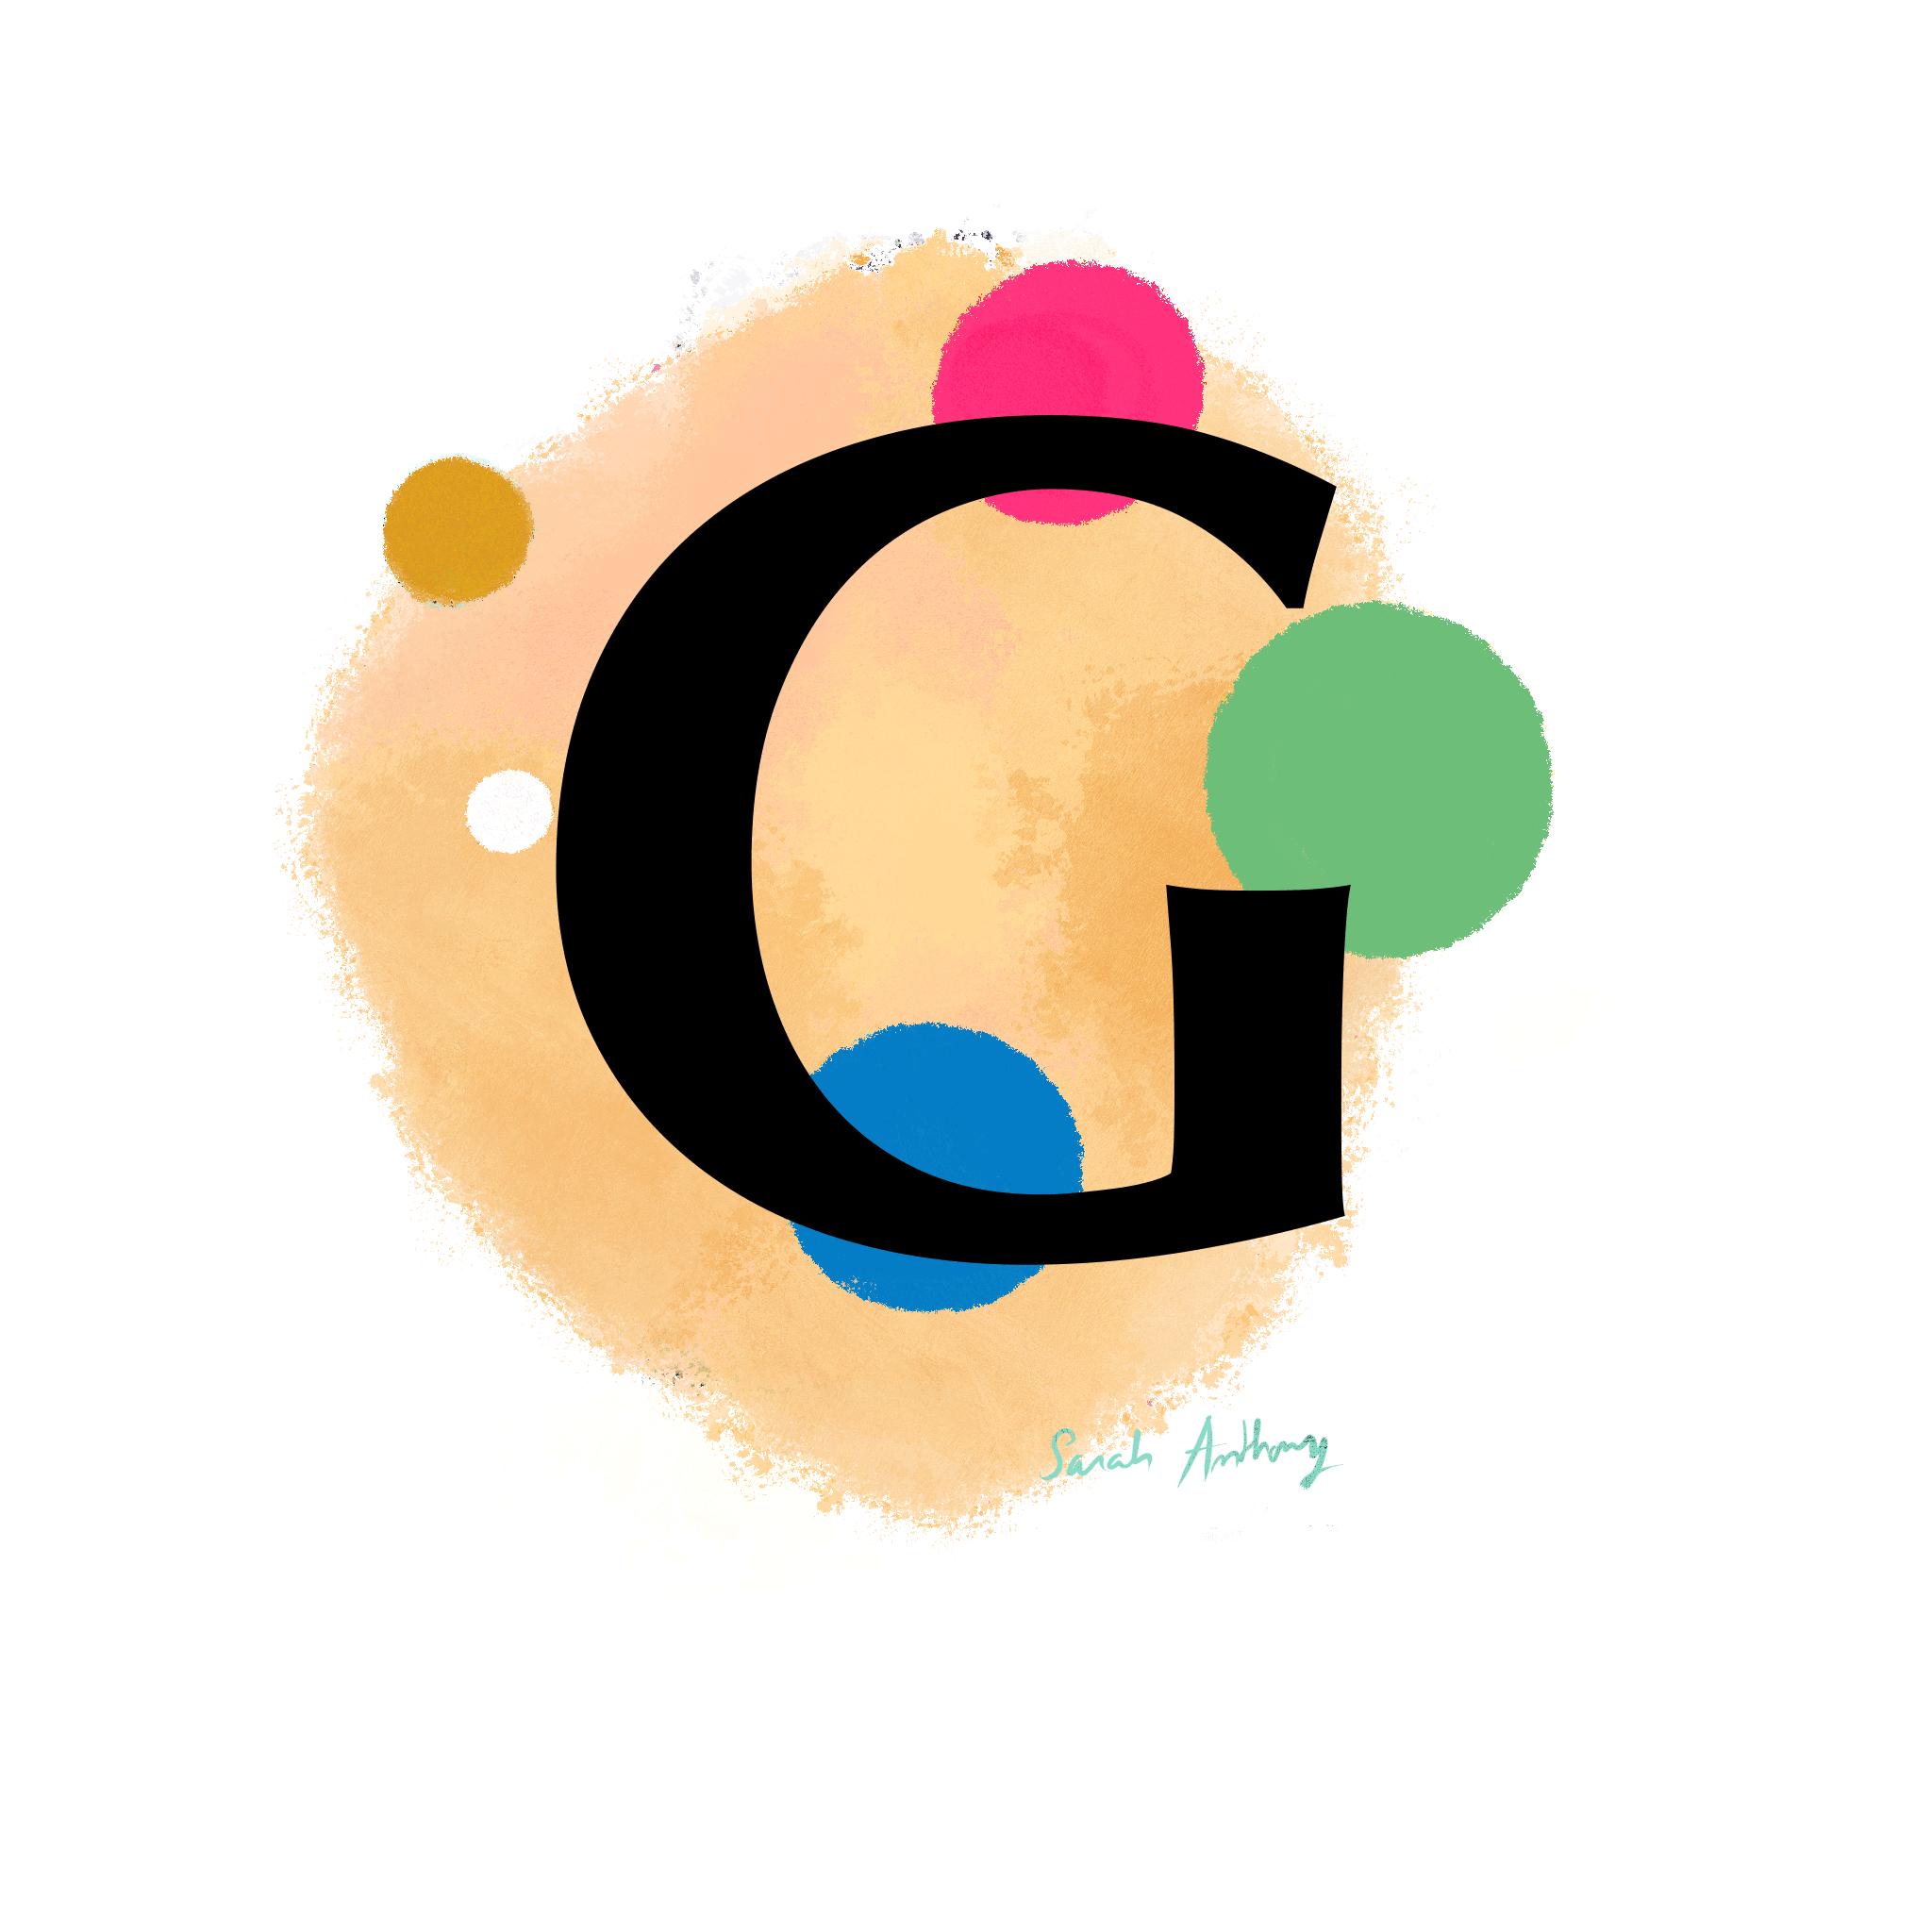 G-r-duit-sarah-anthony